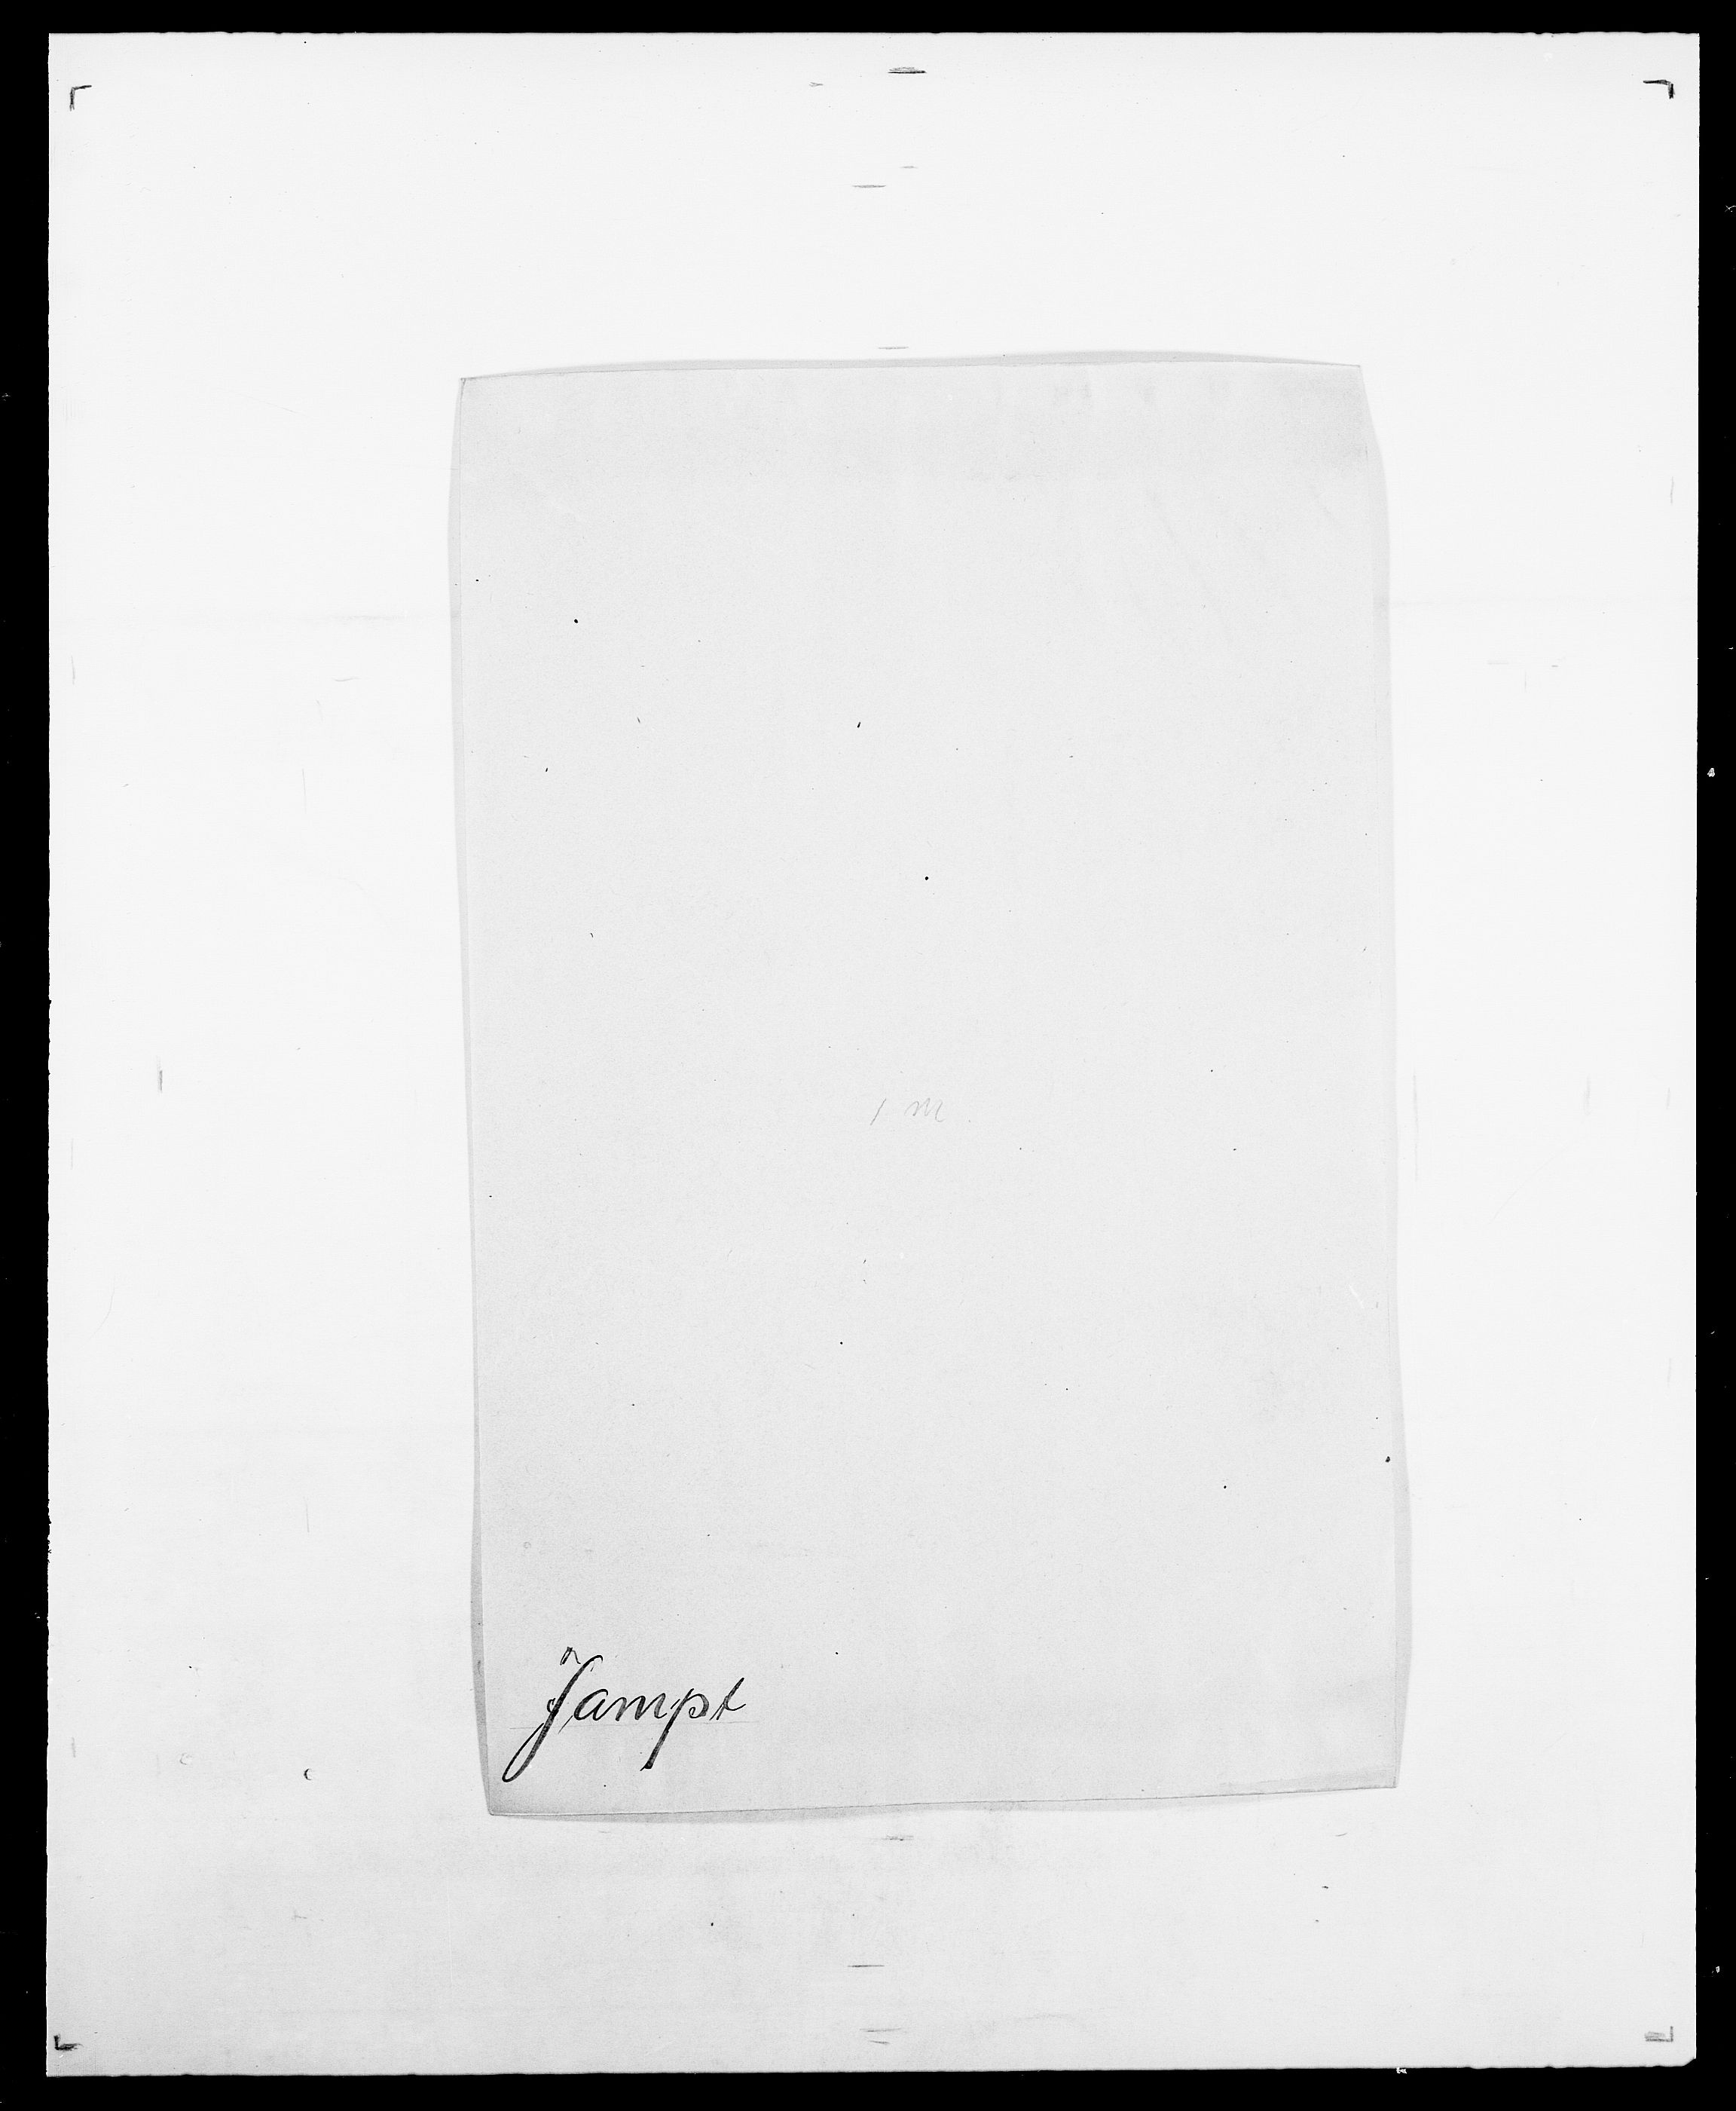 SAO, Delgobe, Charles Antoine - samling, D/Da/L0019: van der Hude - Joys, s. 534